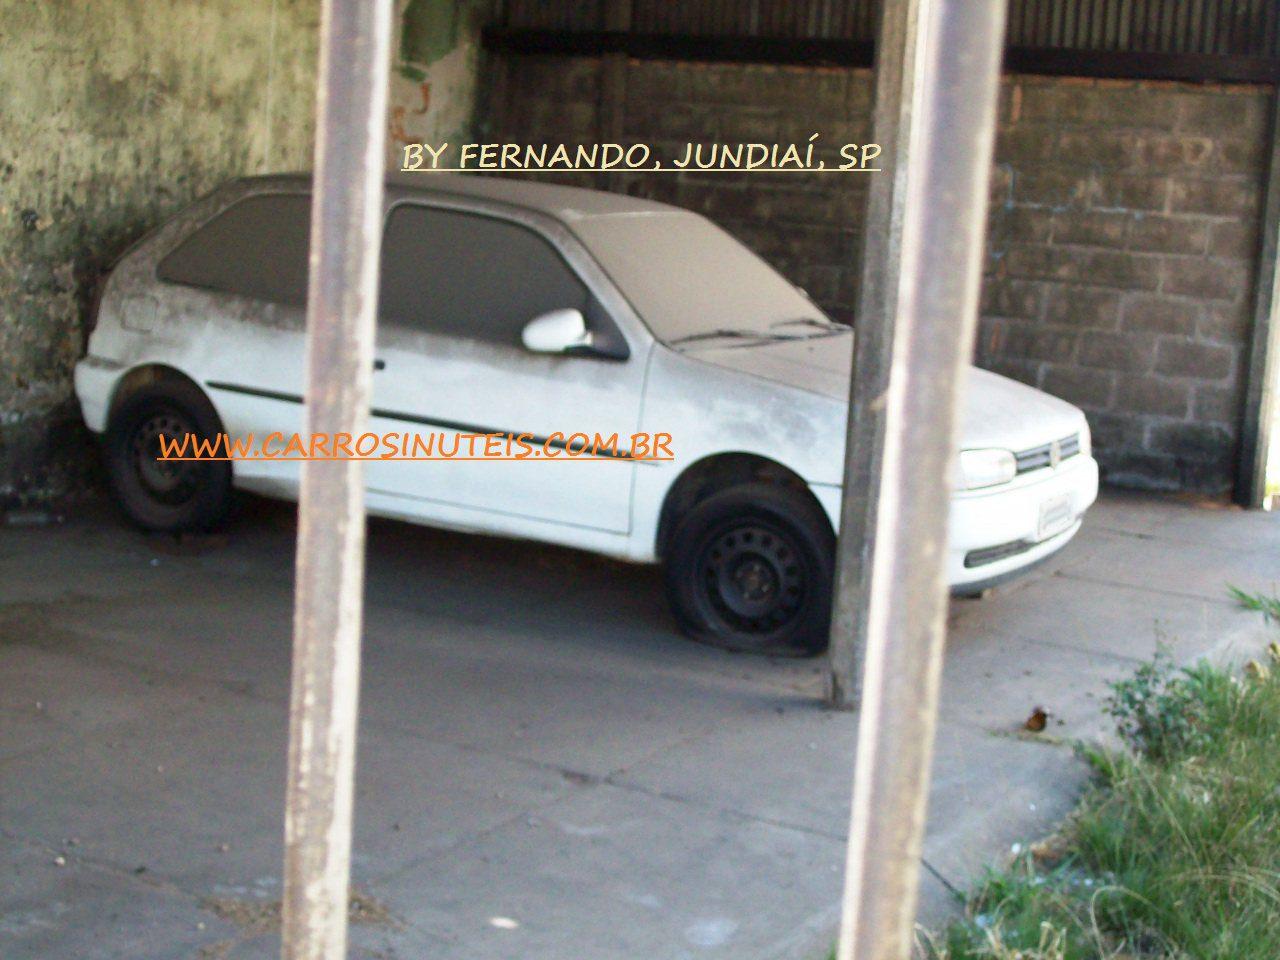 Fernando-Jundiaí-SP-g VW Gol, foto de Fernando, Jundiaí-SP